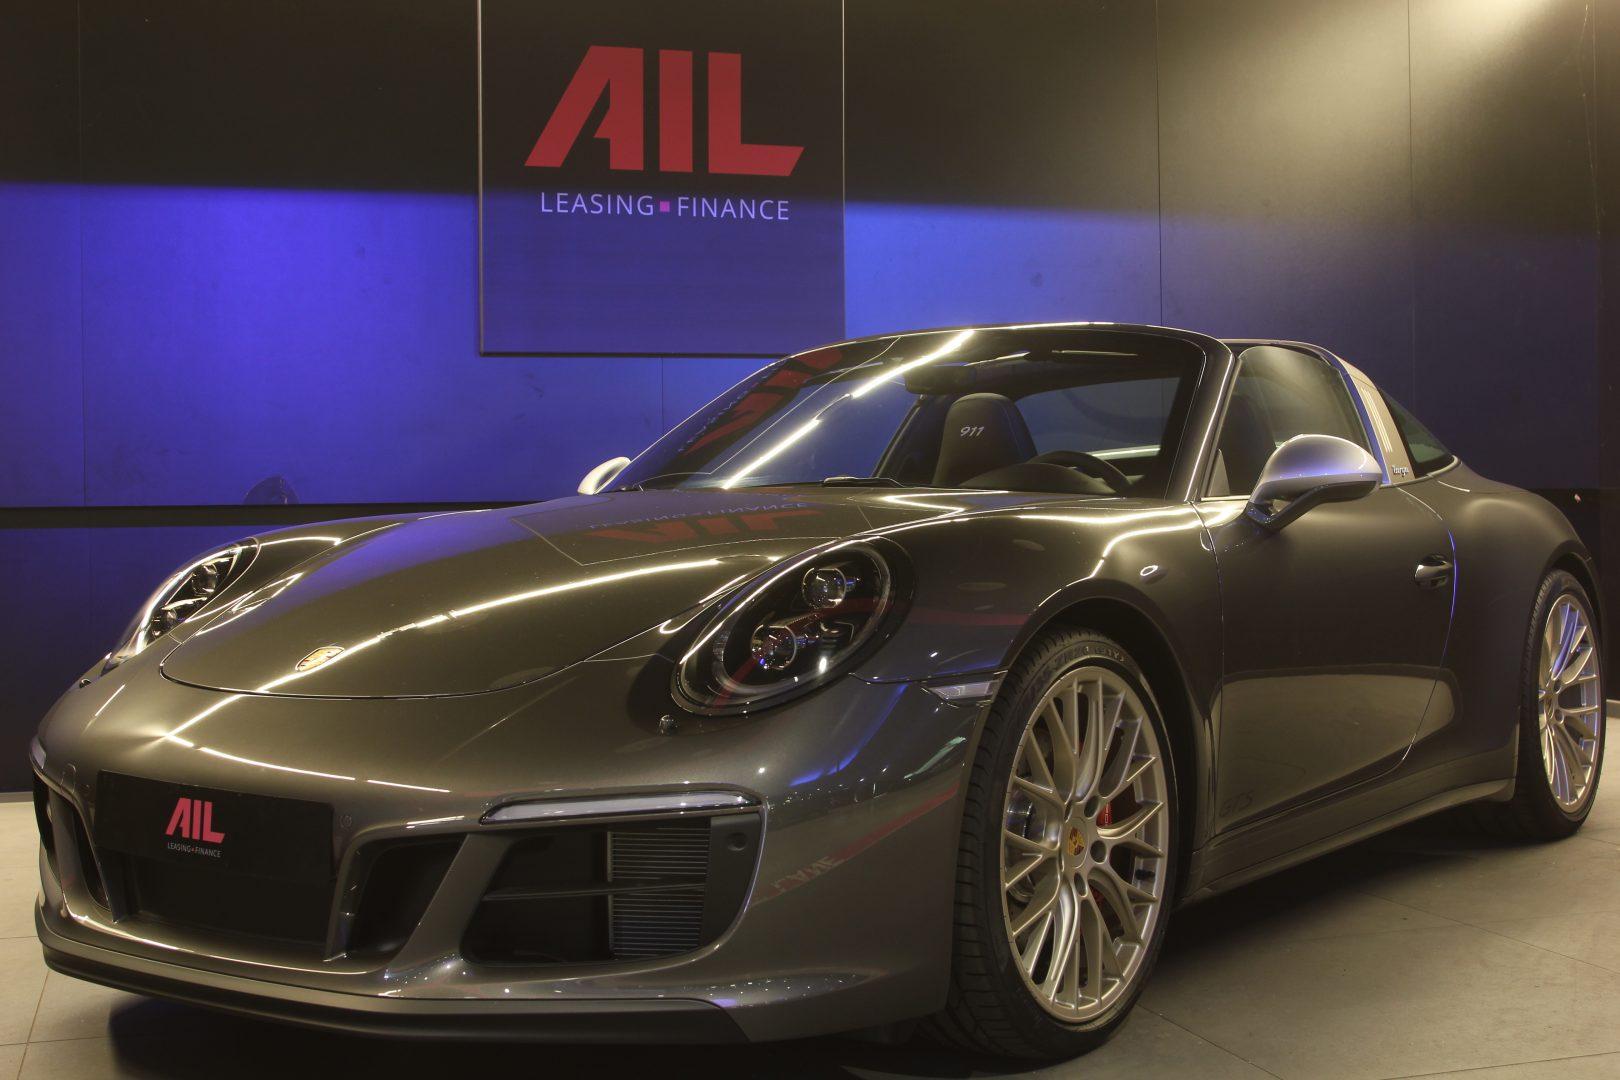 AIL Porsche 991 Targa 4 GTS Exclusiv 9